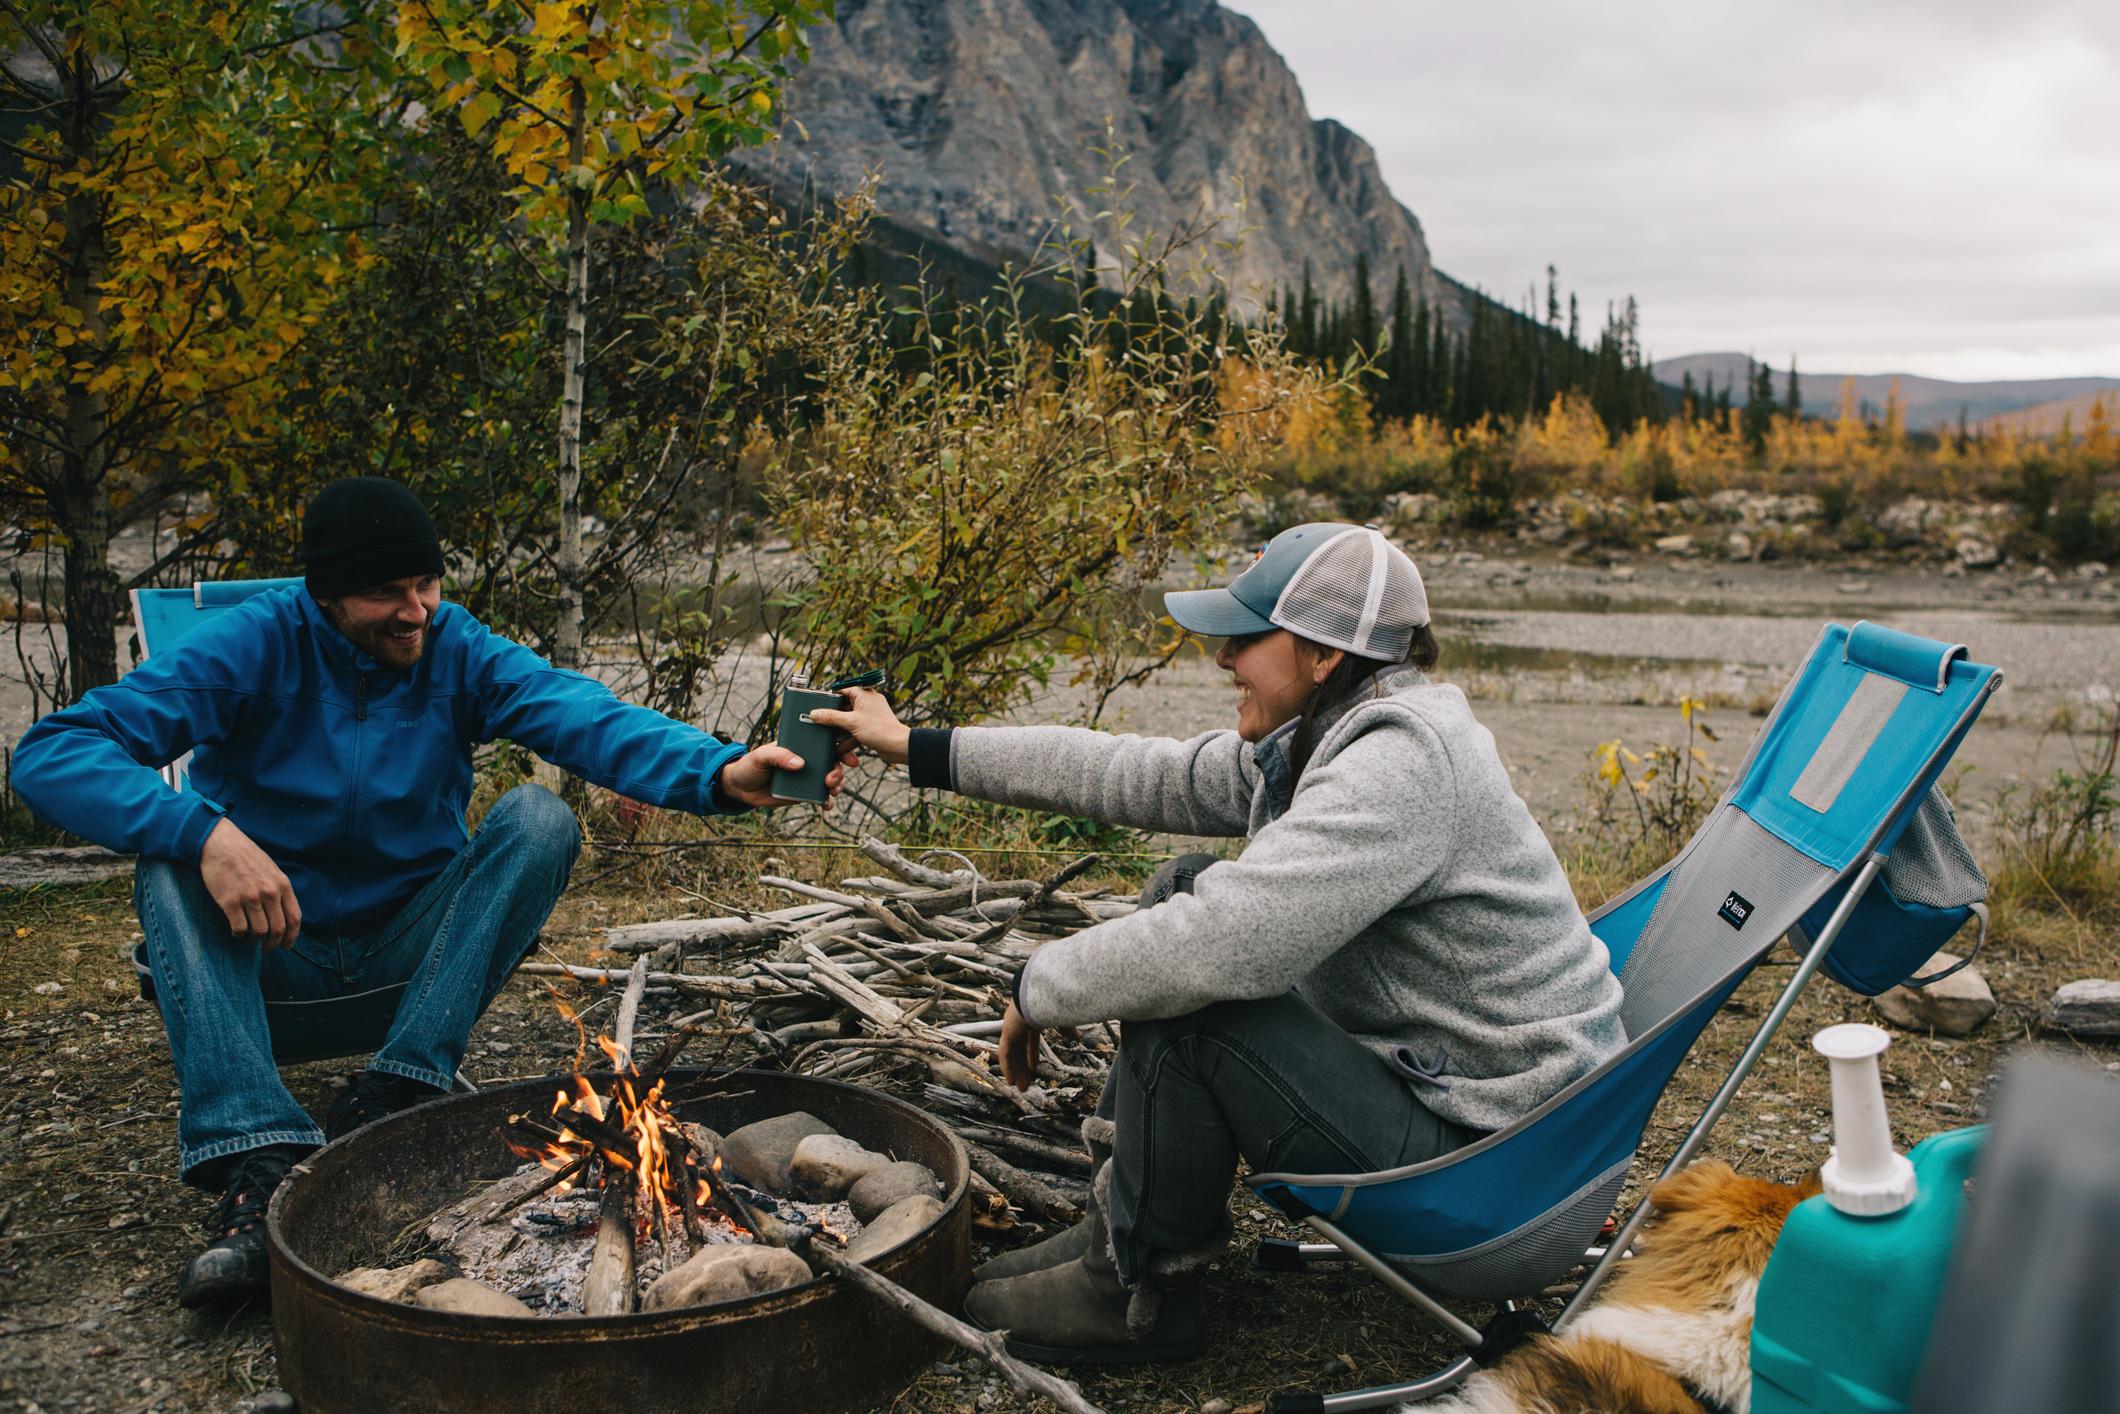 CindyGiovagnoli_Alaska_KoyukukRiver_SukakpakMountain_JimRiver_ArcticCircle_fly_fishing_September-012.jpg